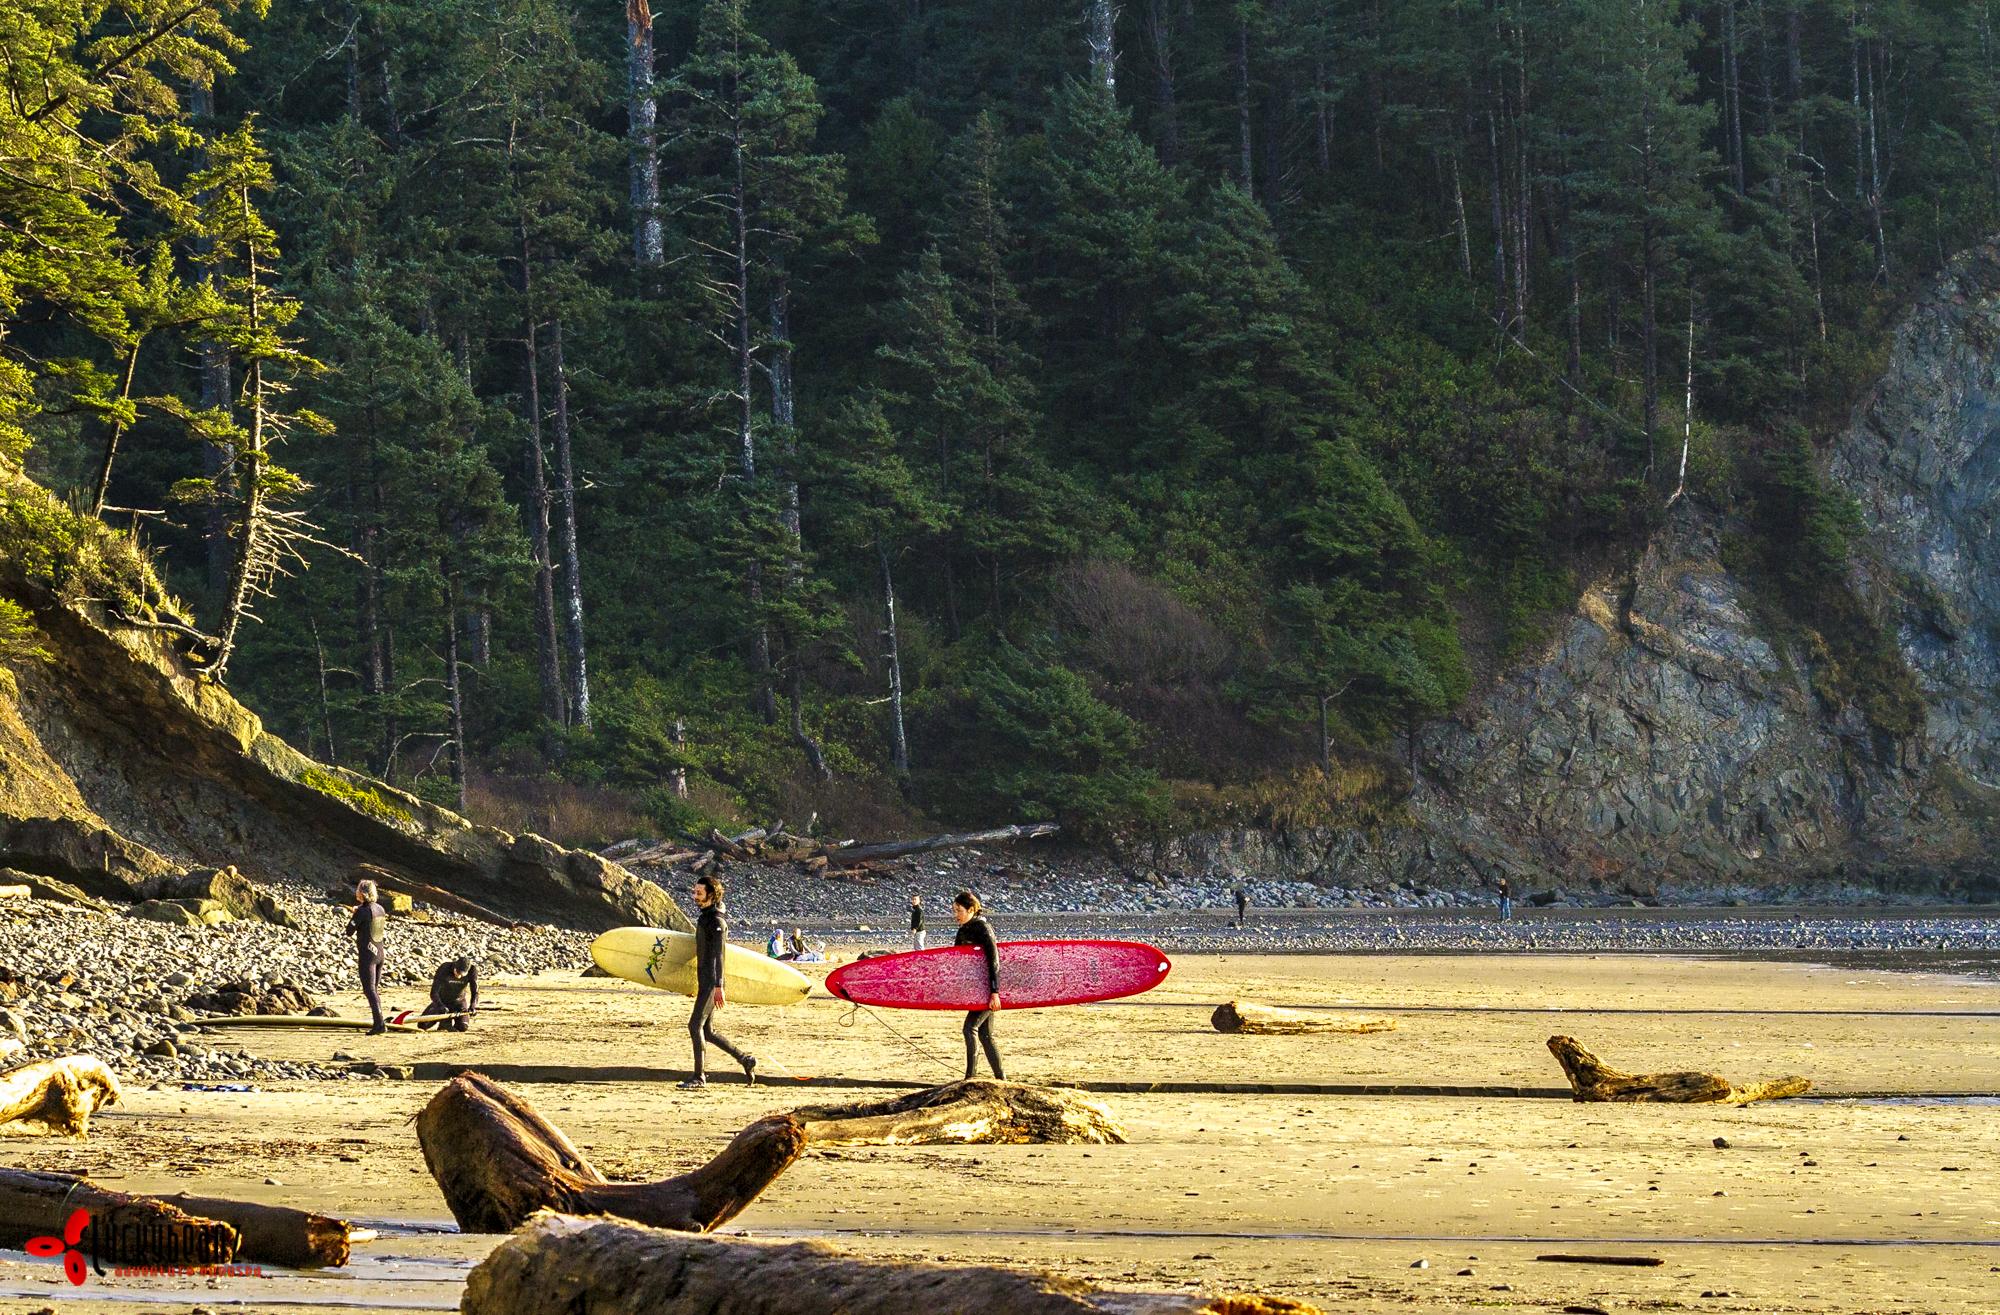 Oregon surf culture.